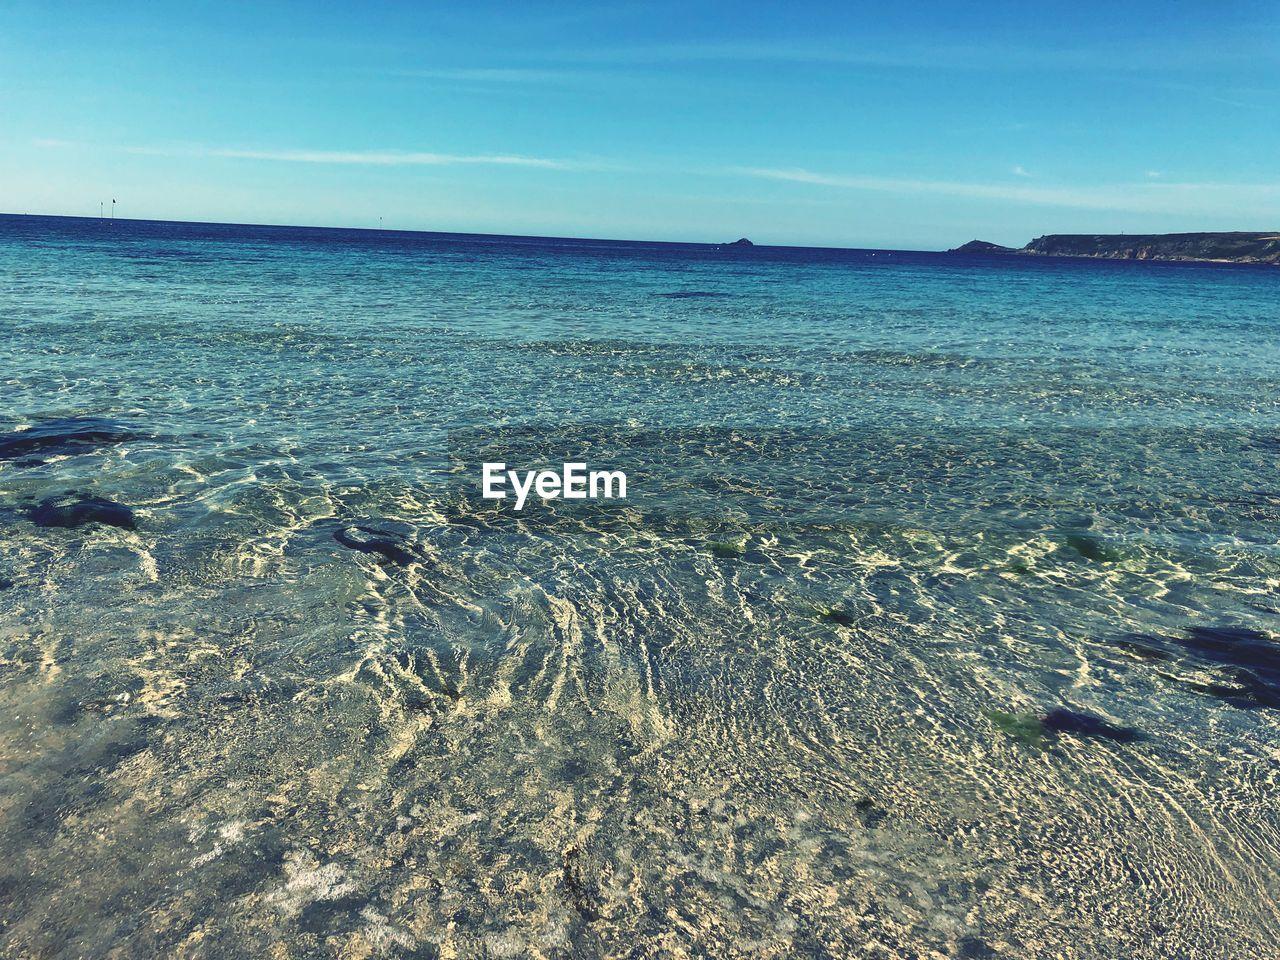 sea, water, beauty in nature, sky, nature, tranquility, scenics - nature, no people, tranquil scene, land, blue, day, horizon, horizon over water, idyllic, beach, outdoors, non-urban scene, waterfront, marine, shallow